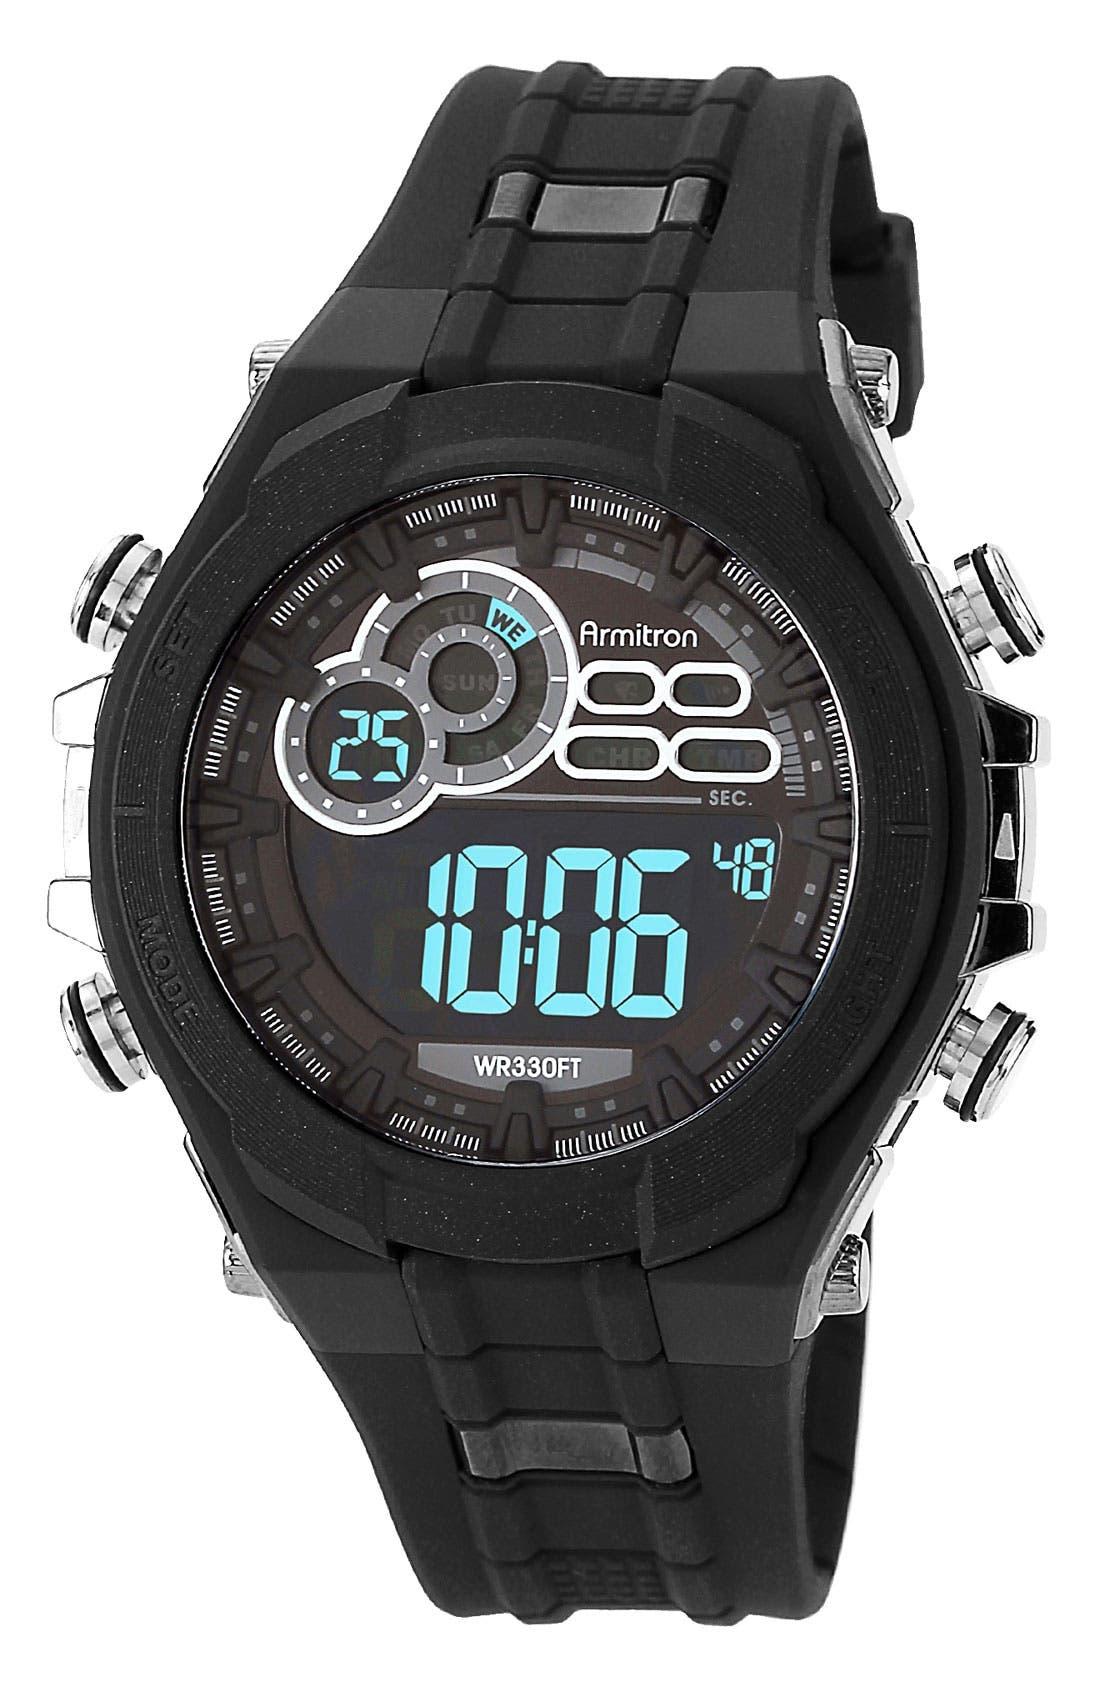 Alternate Image 1 Selected - Armitron Digital Resin Watch, 49mm